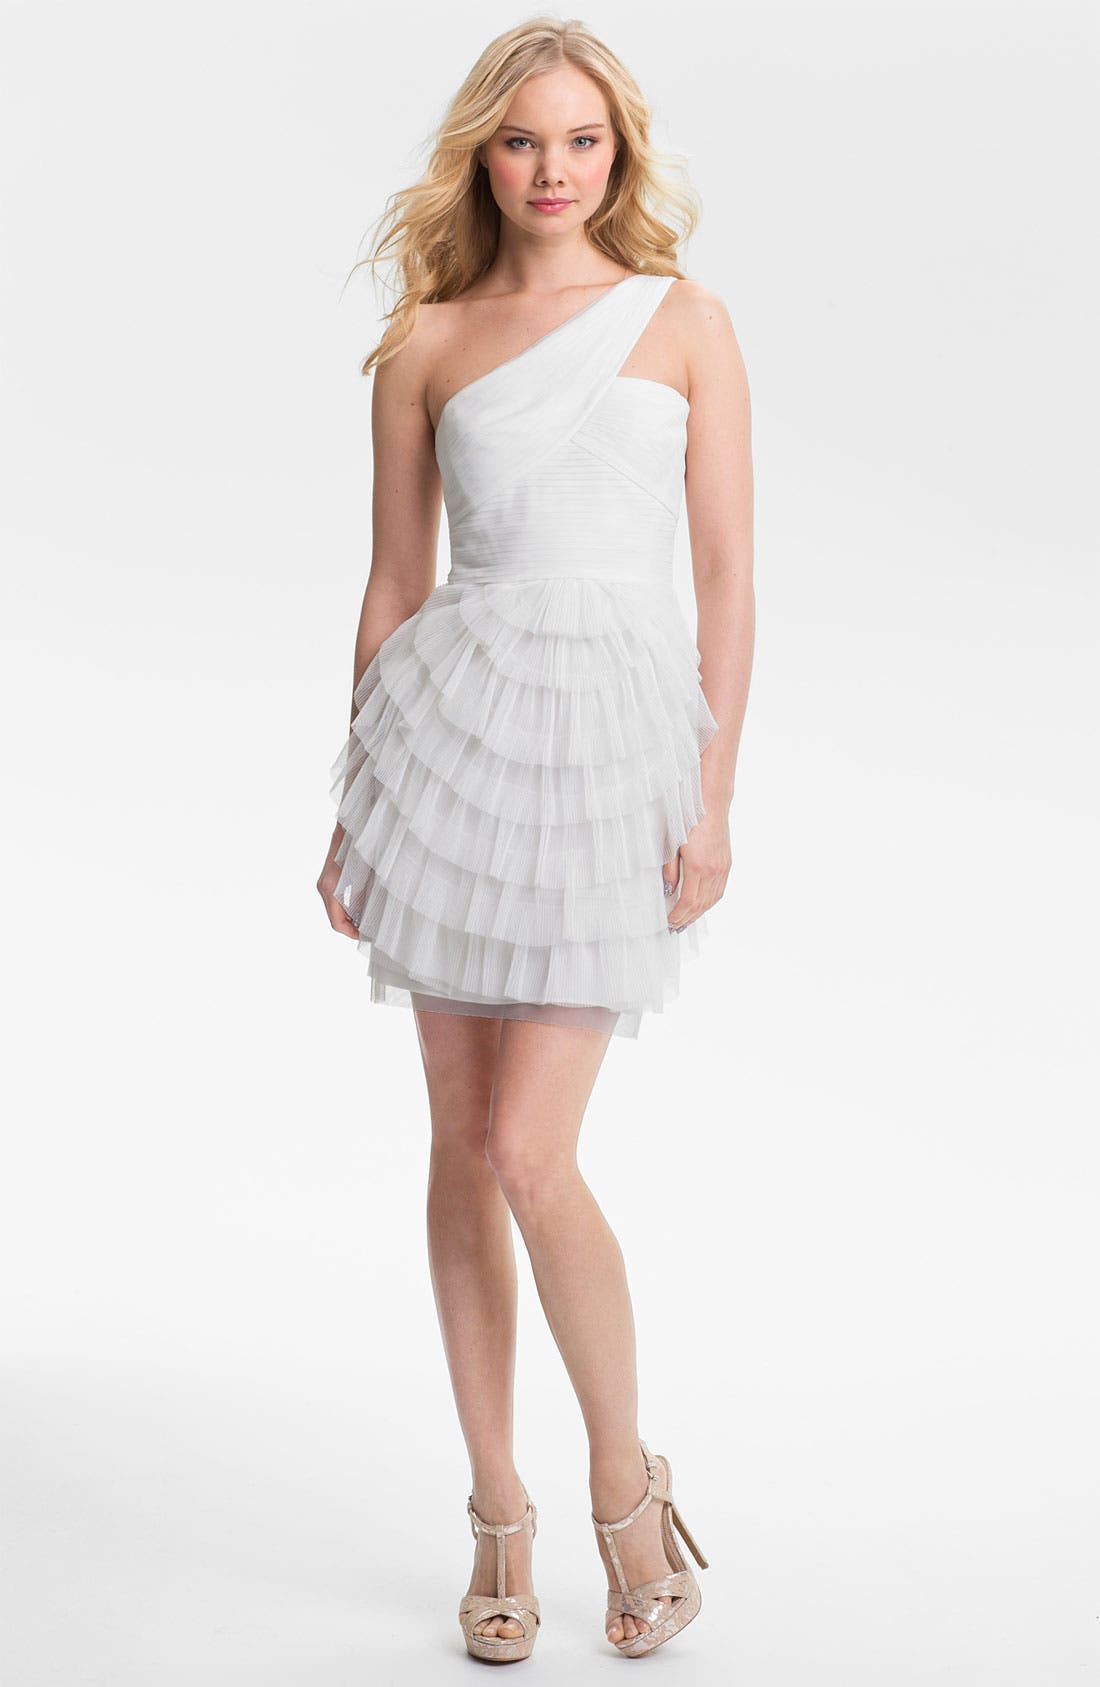 Main Image - BCBGMAXAZRIA 'Ella' One Shoulder Tiered Tulle Dress